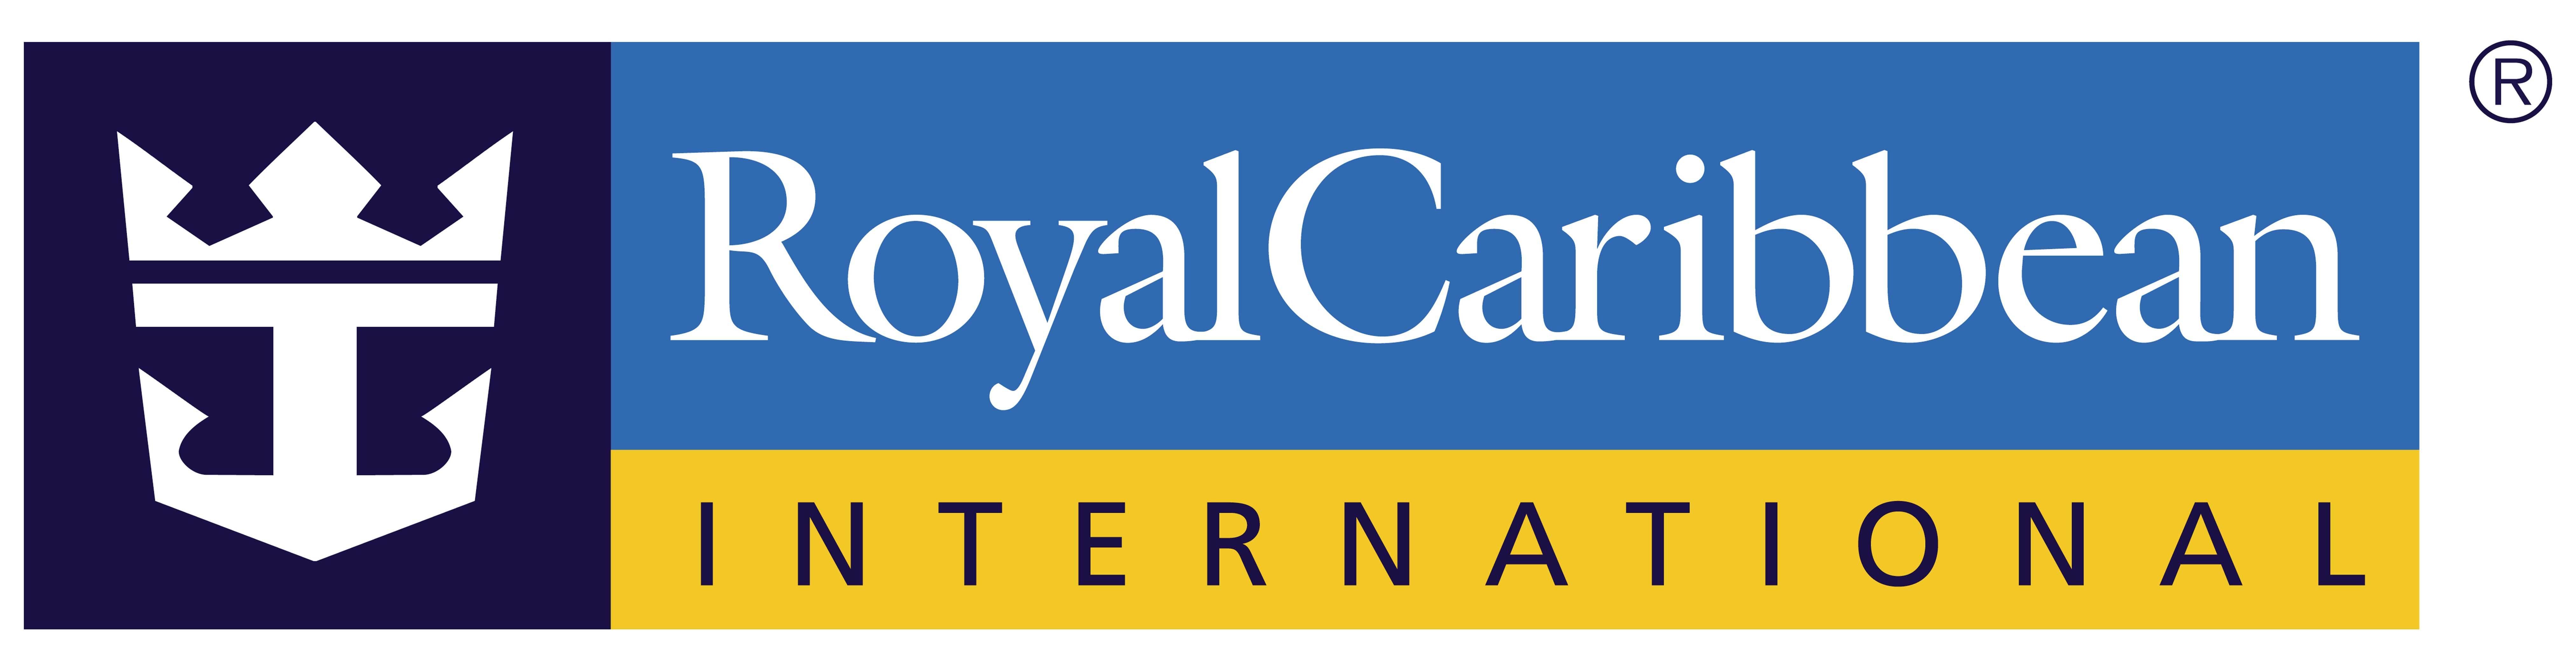 royalcaribbean.jpg